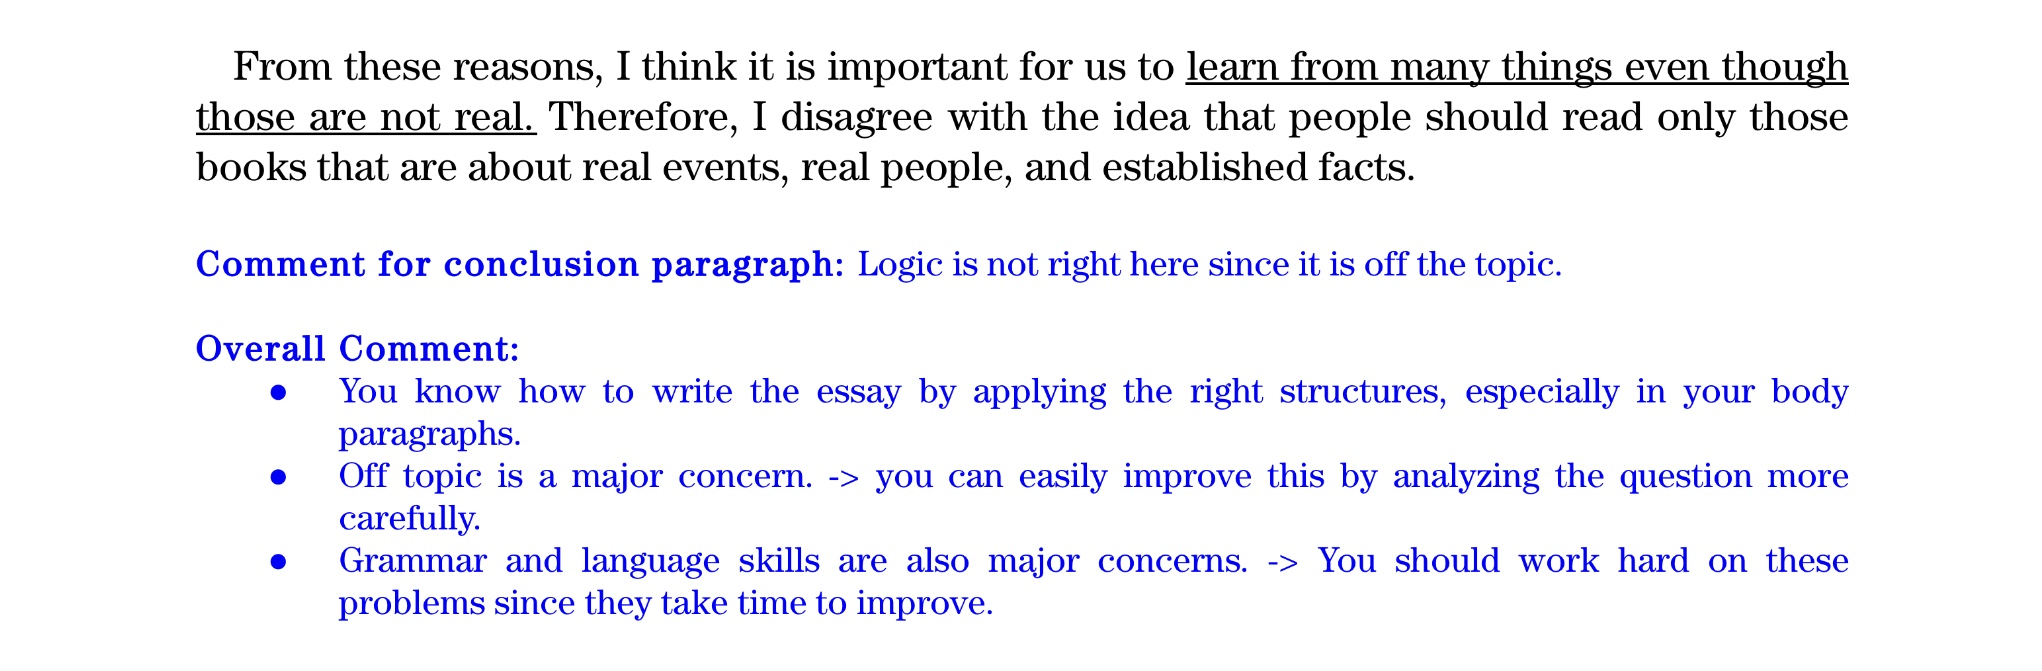 TOEFL ライティング 添削例❷ コンクルージョン